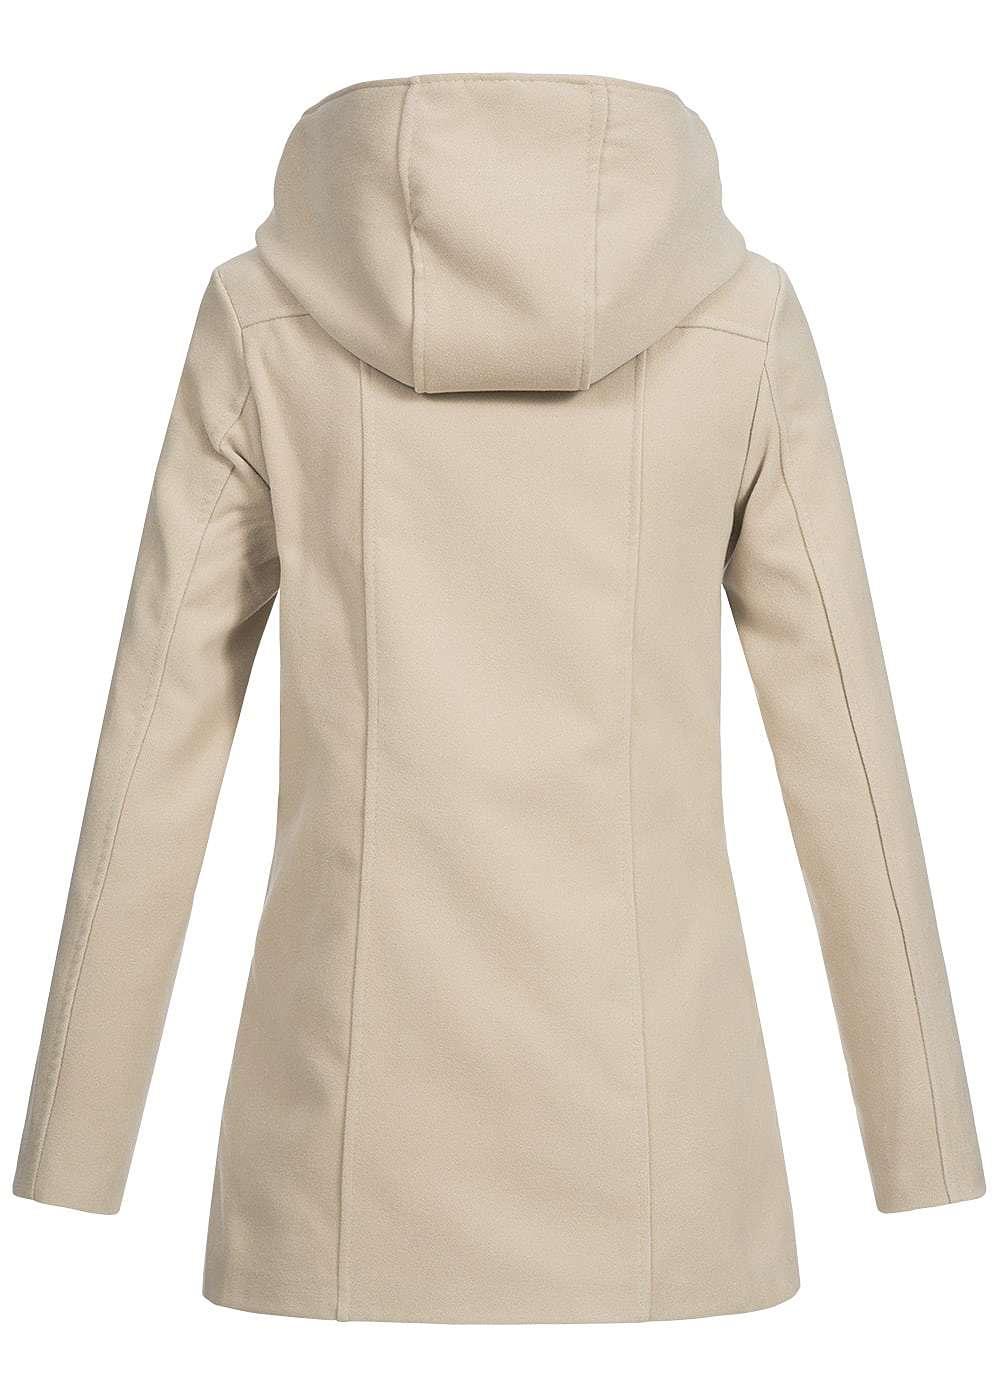 styleboom fashion damen fleece jacke asym zipper. Black Bedroom Furniture Sets. Home Design Ideas